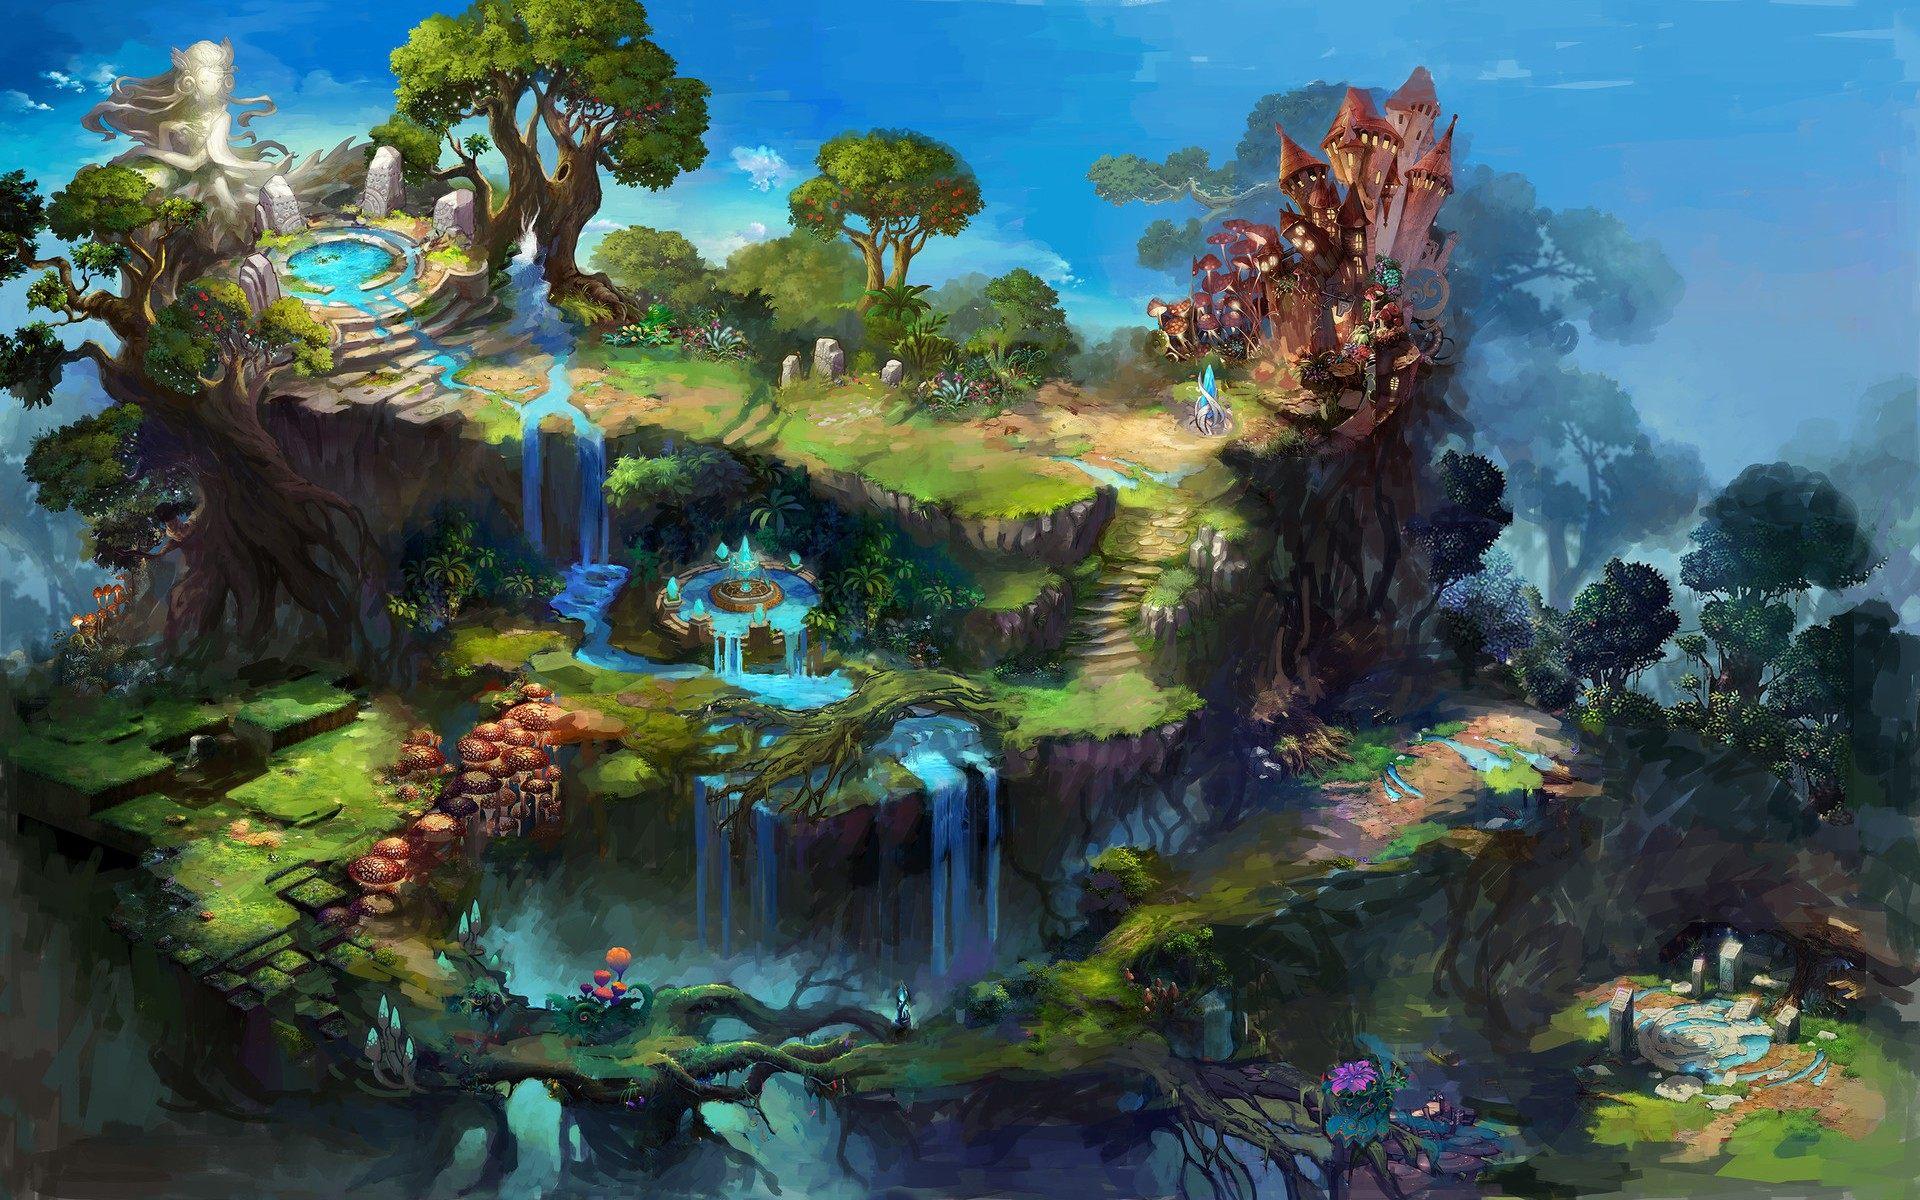 Fantasy Land HD Wallpaper For Desktop Laptop Mobile